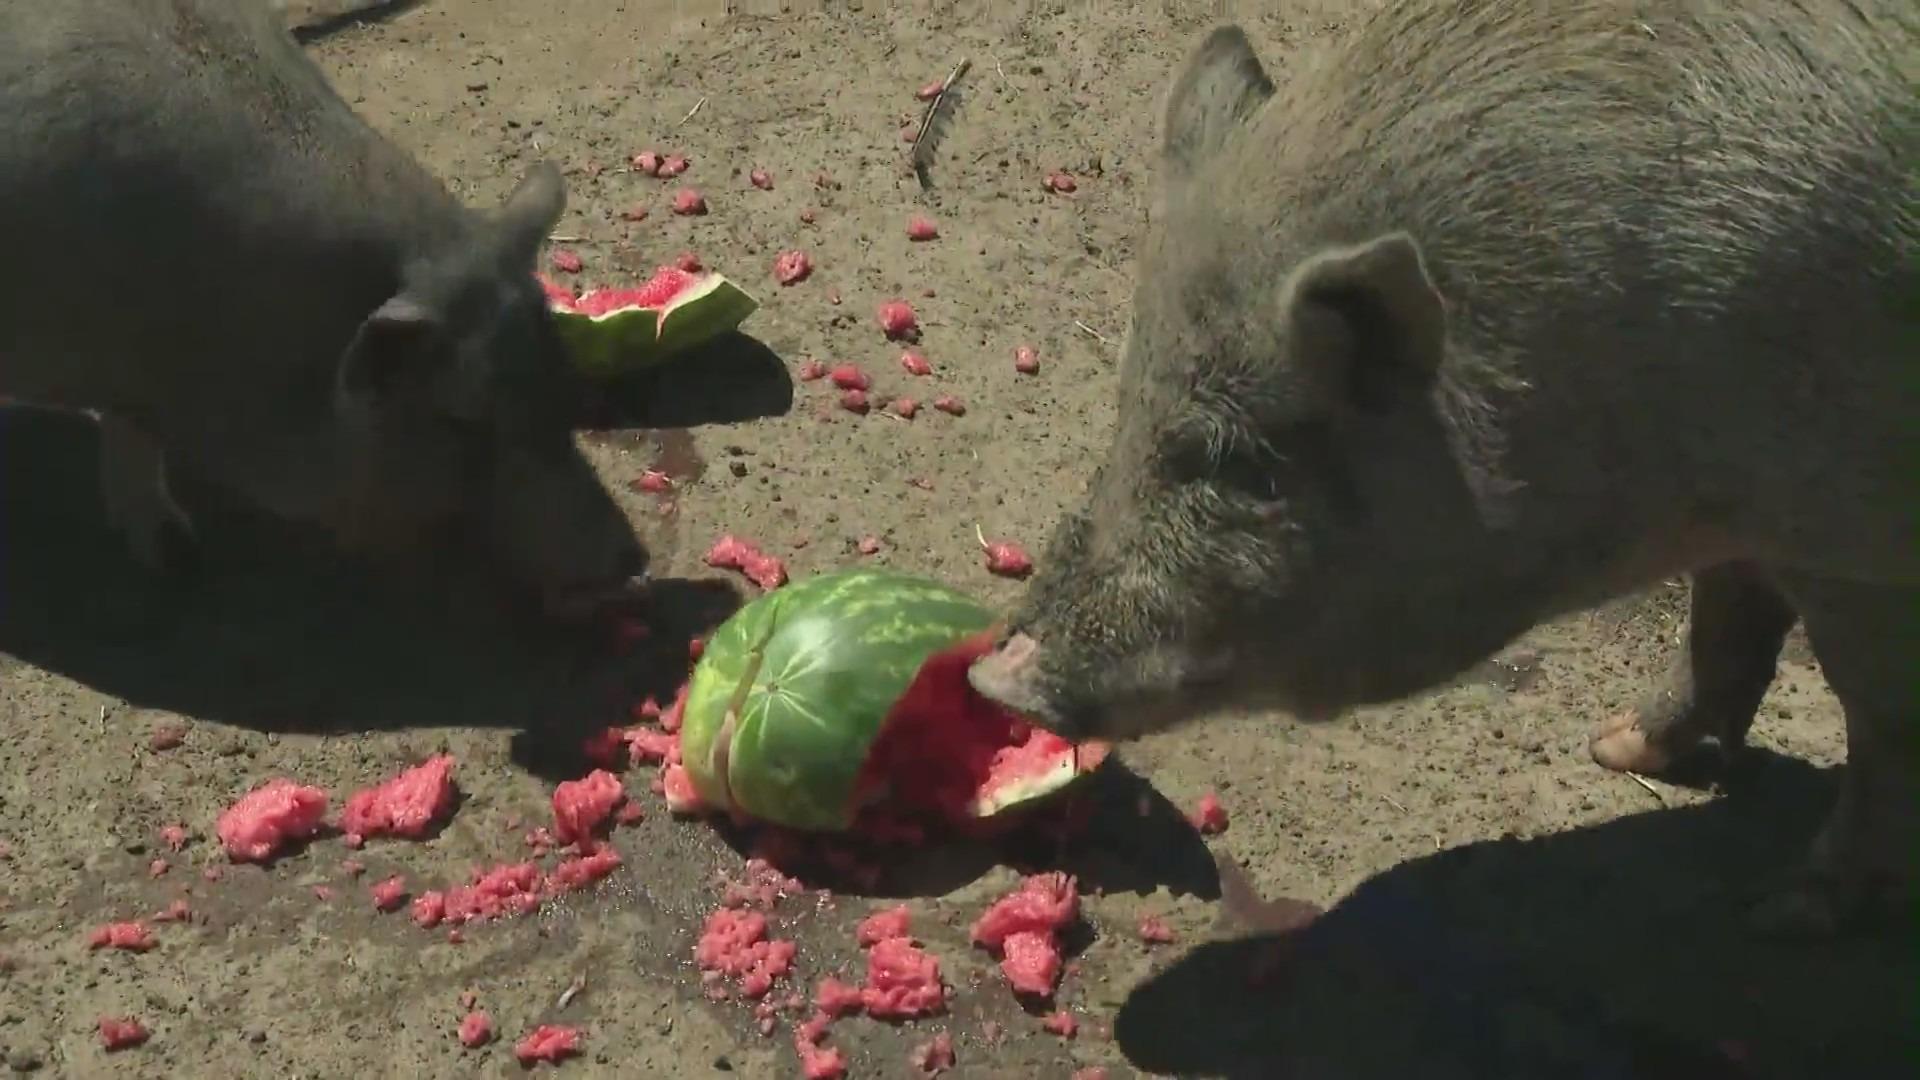 Pigs at Buster's Barn. (KTLA)